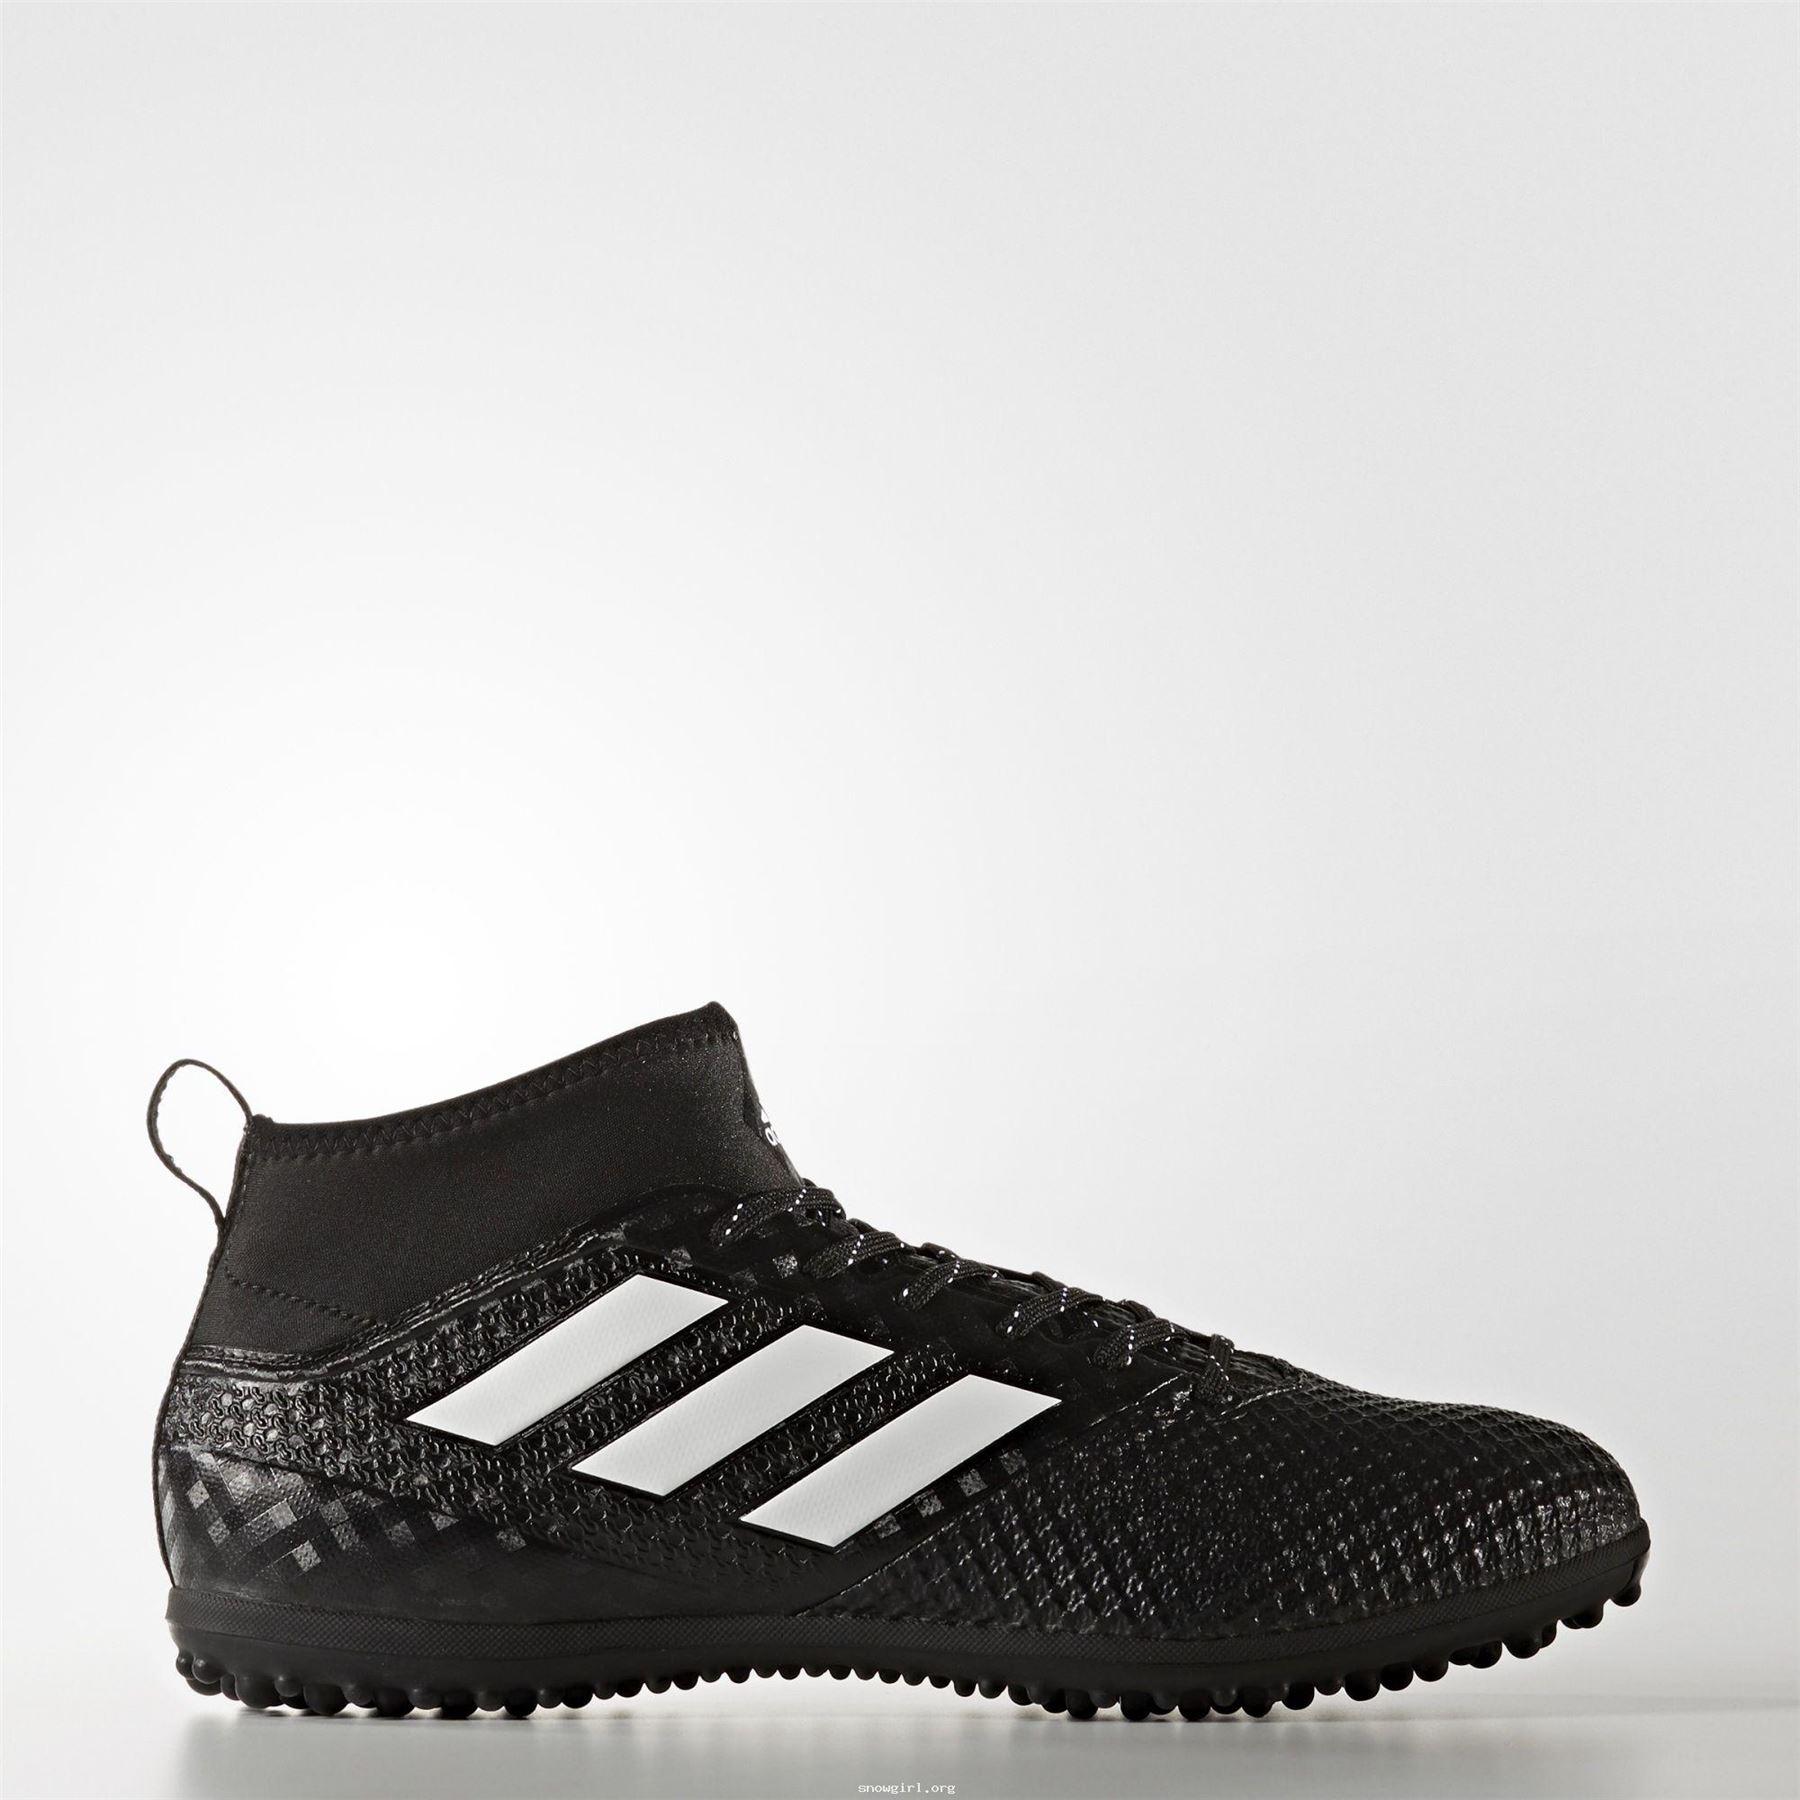 fe5ca6a66d49 ... sale adidas ace 17.3 primemesh astro turf football shoes mens black  soccer trainers ac077 60e7a